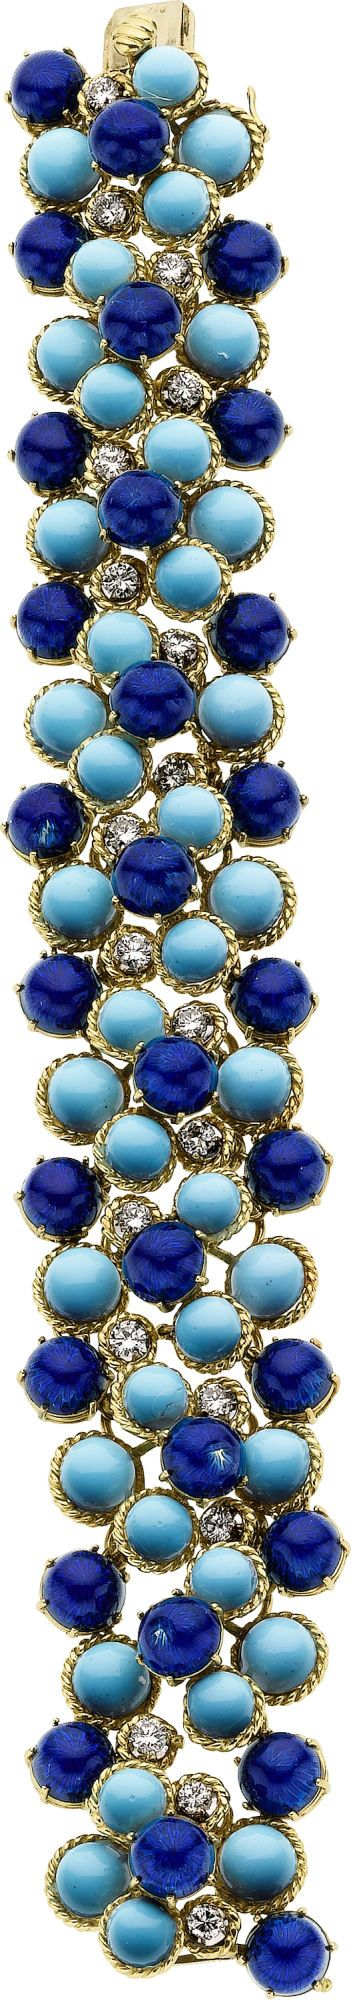 Diamond, Enamel, Gold Bracelet. ... Estate JewelryBracelets   Lot #58184   Heritage Auctions